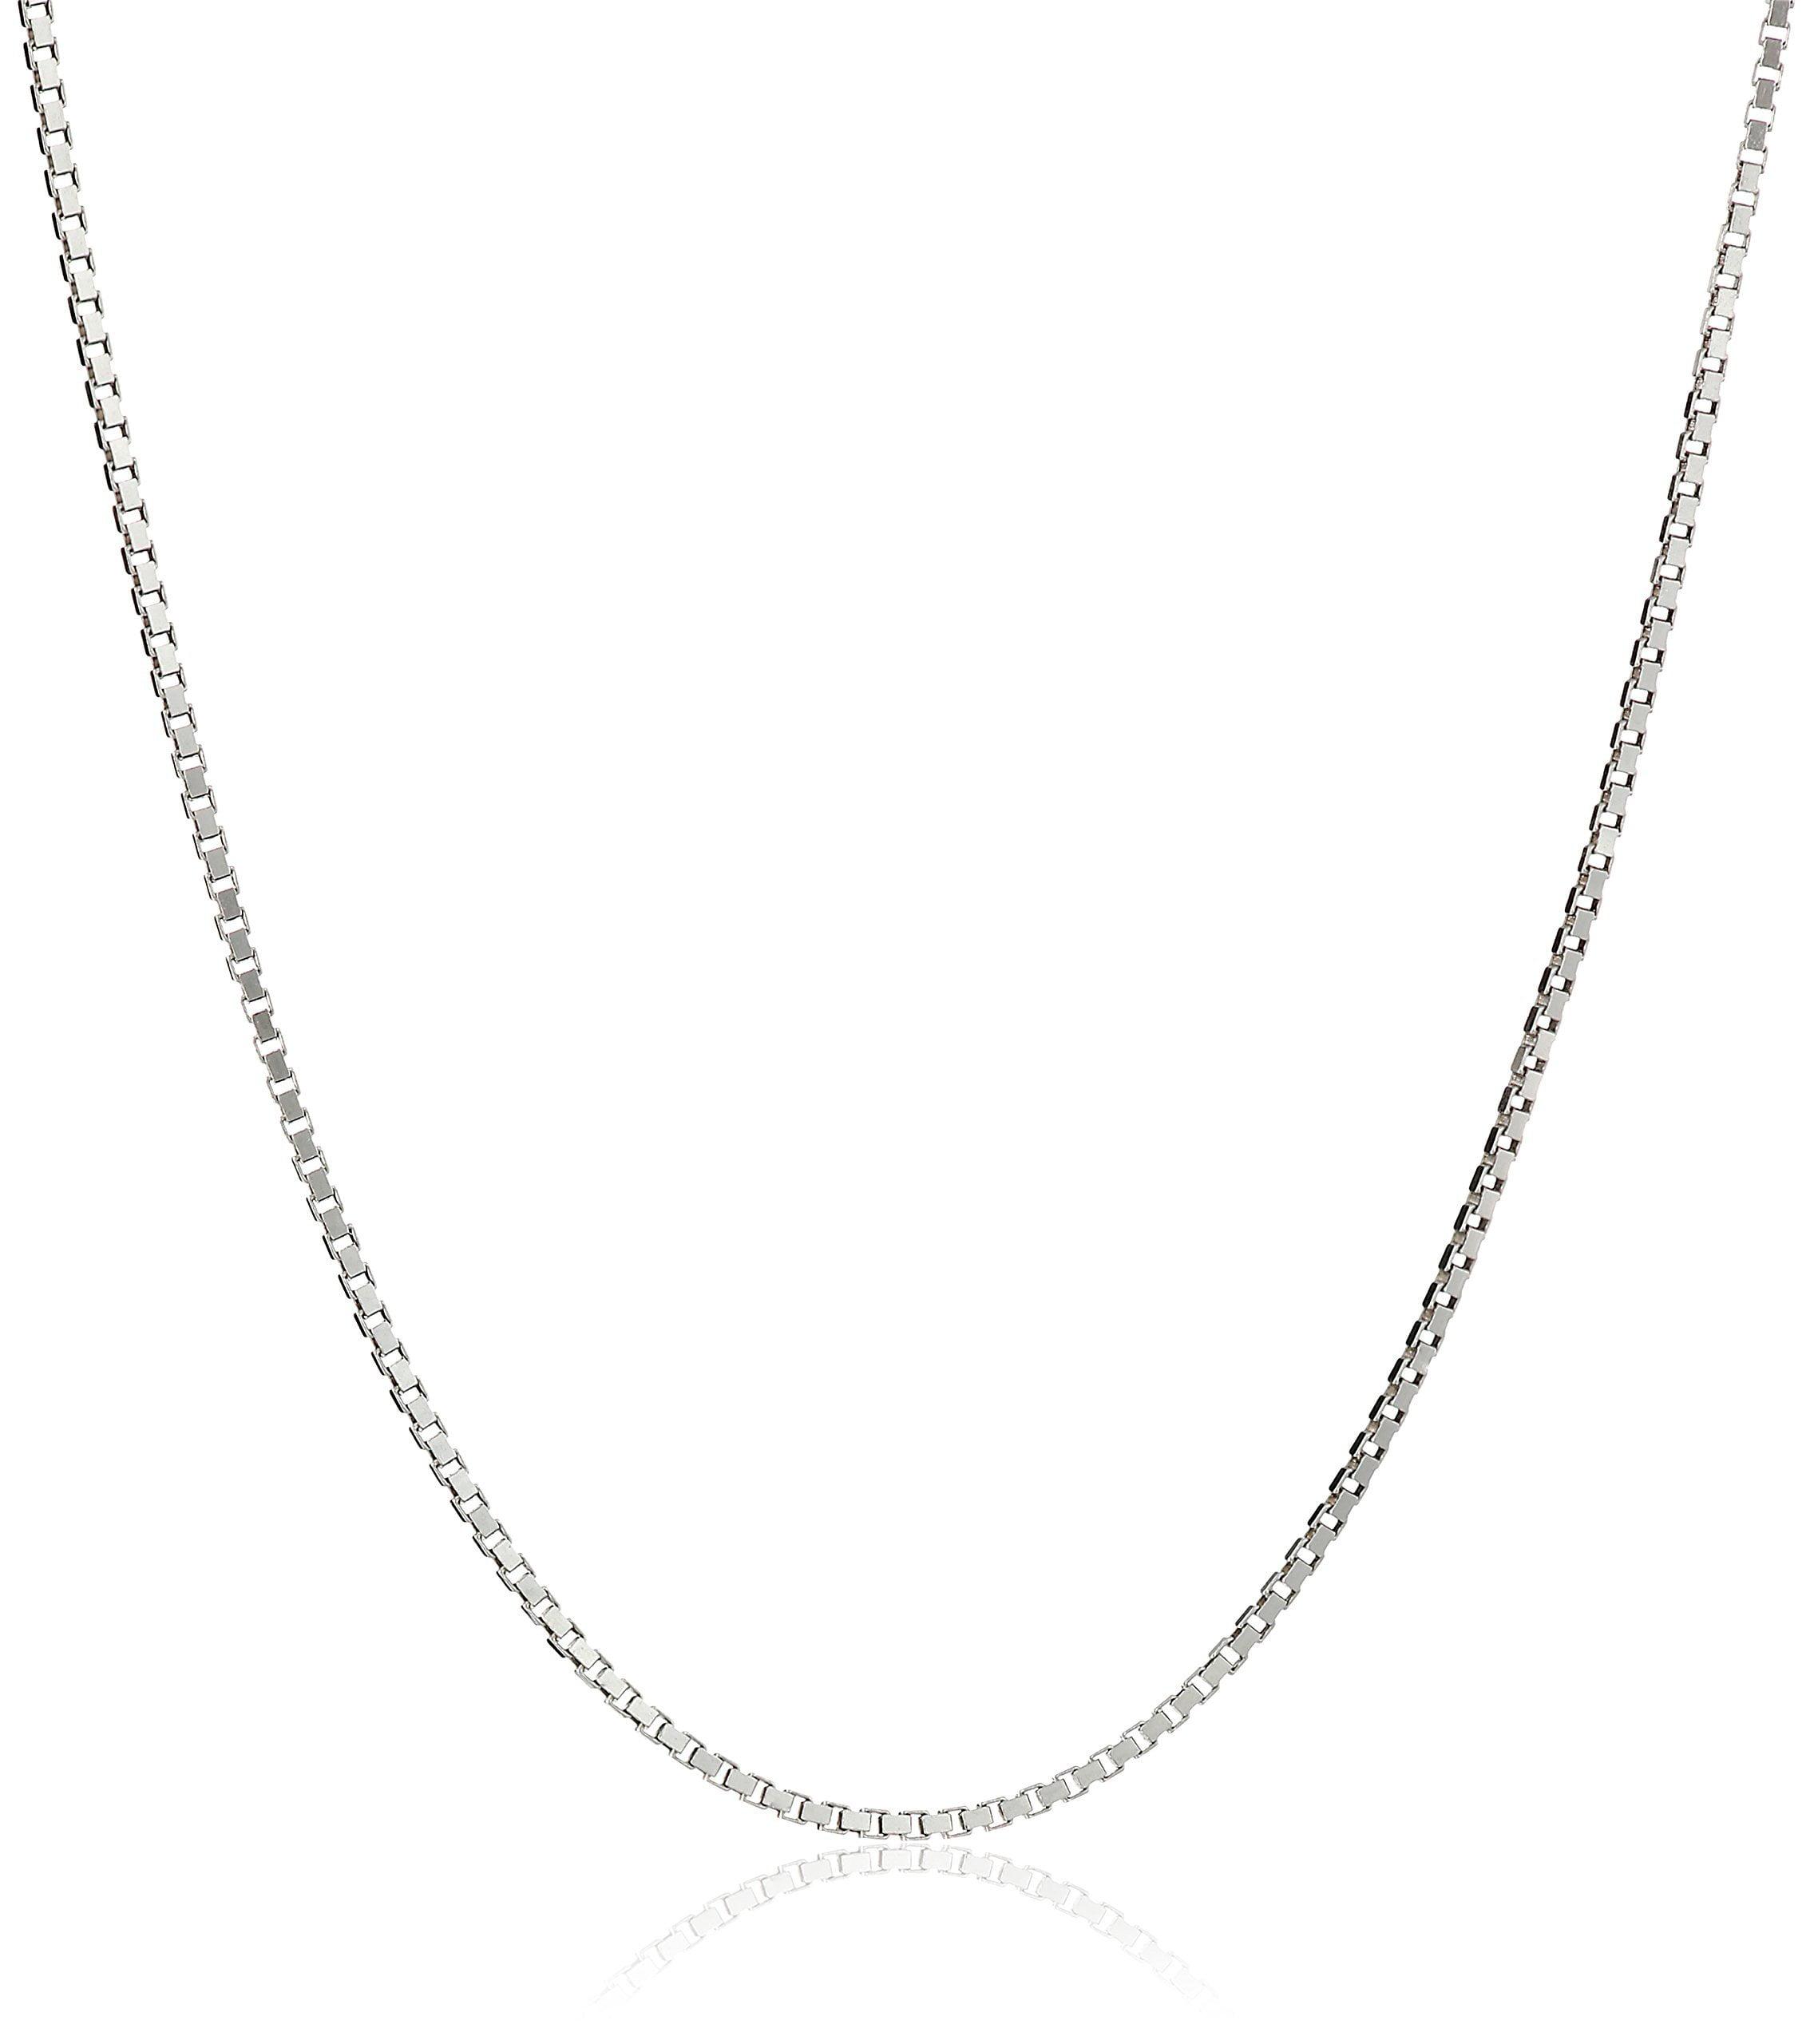 Honolulu Jewelry Honolulu Jewelry Company Sterling Silver 1mm Box Chain Necklace 14 Quot 36 Quot 14 0 Inches Walmart Com Walmart Com